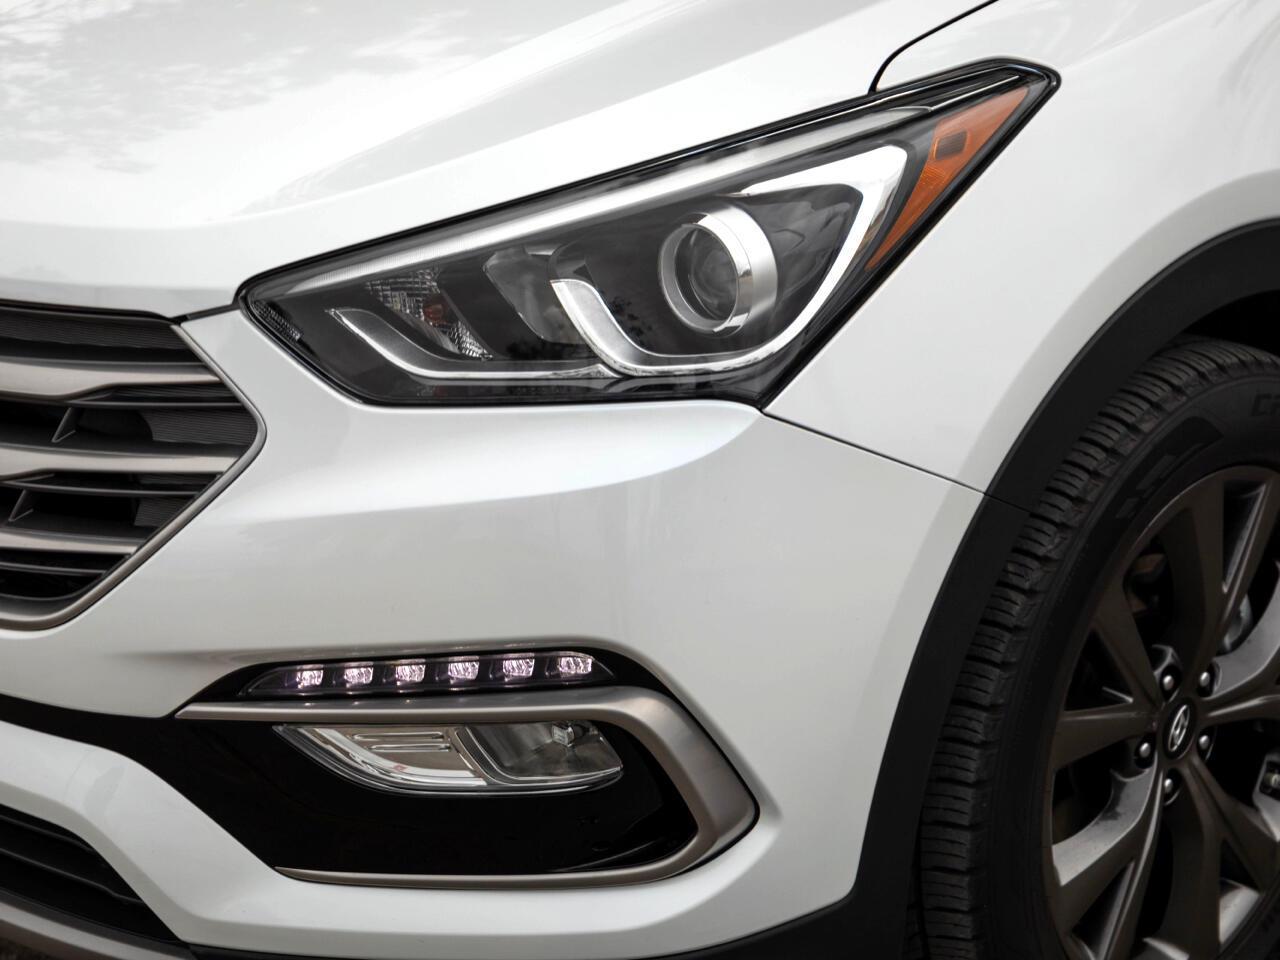 2017 Hyundai Santa Fe (CC-1356438) for sale in Marina Del Rey, California